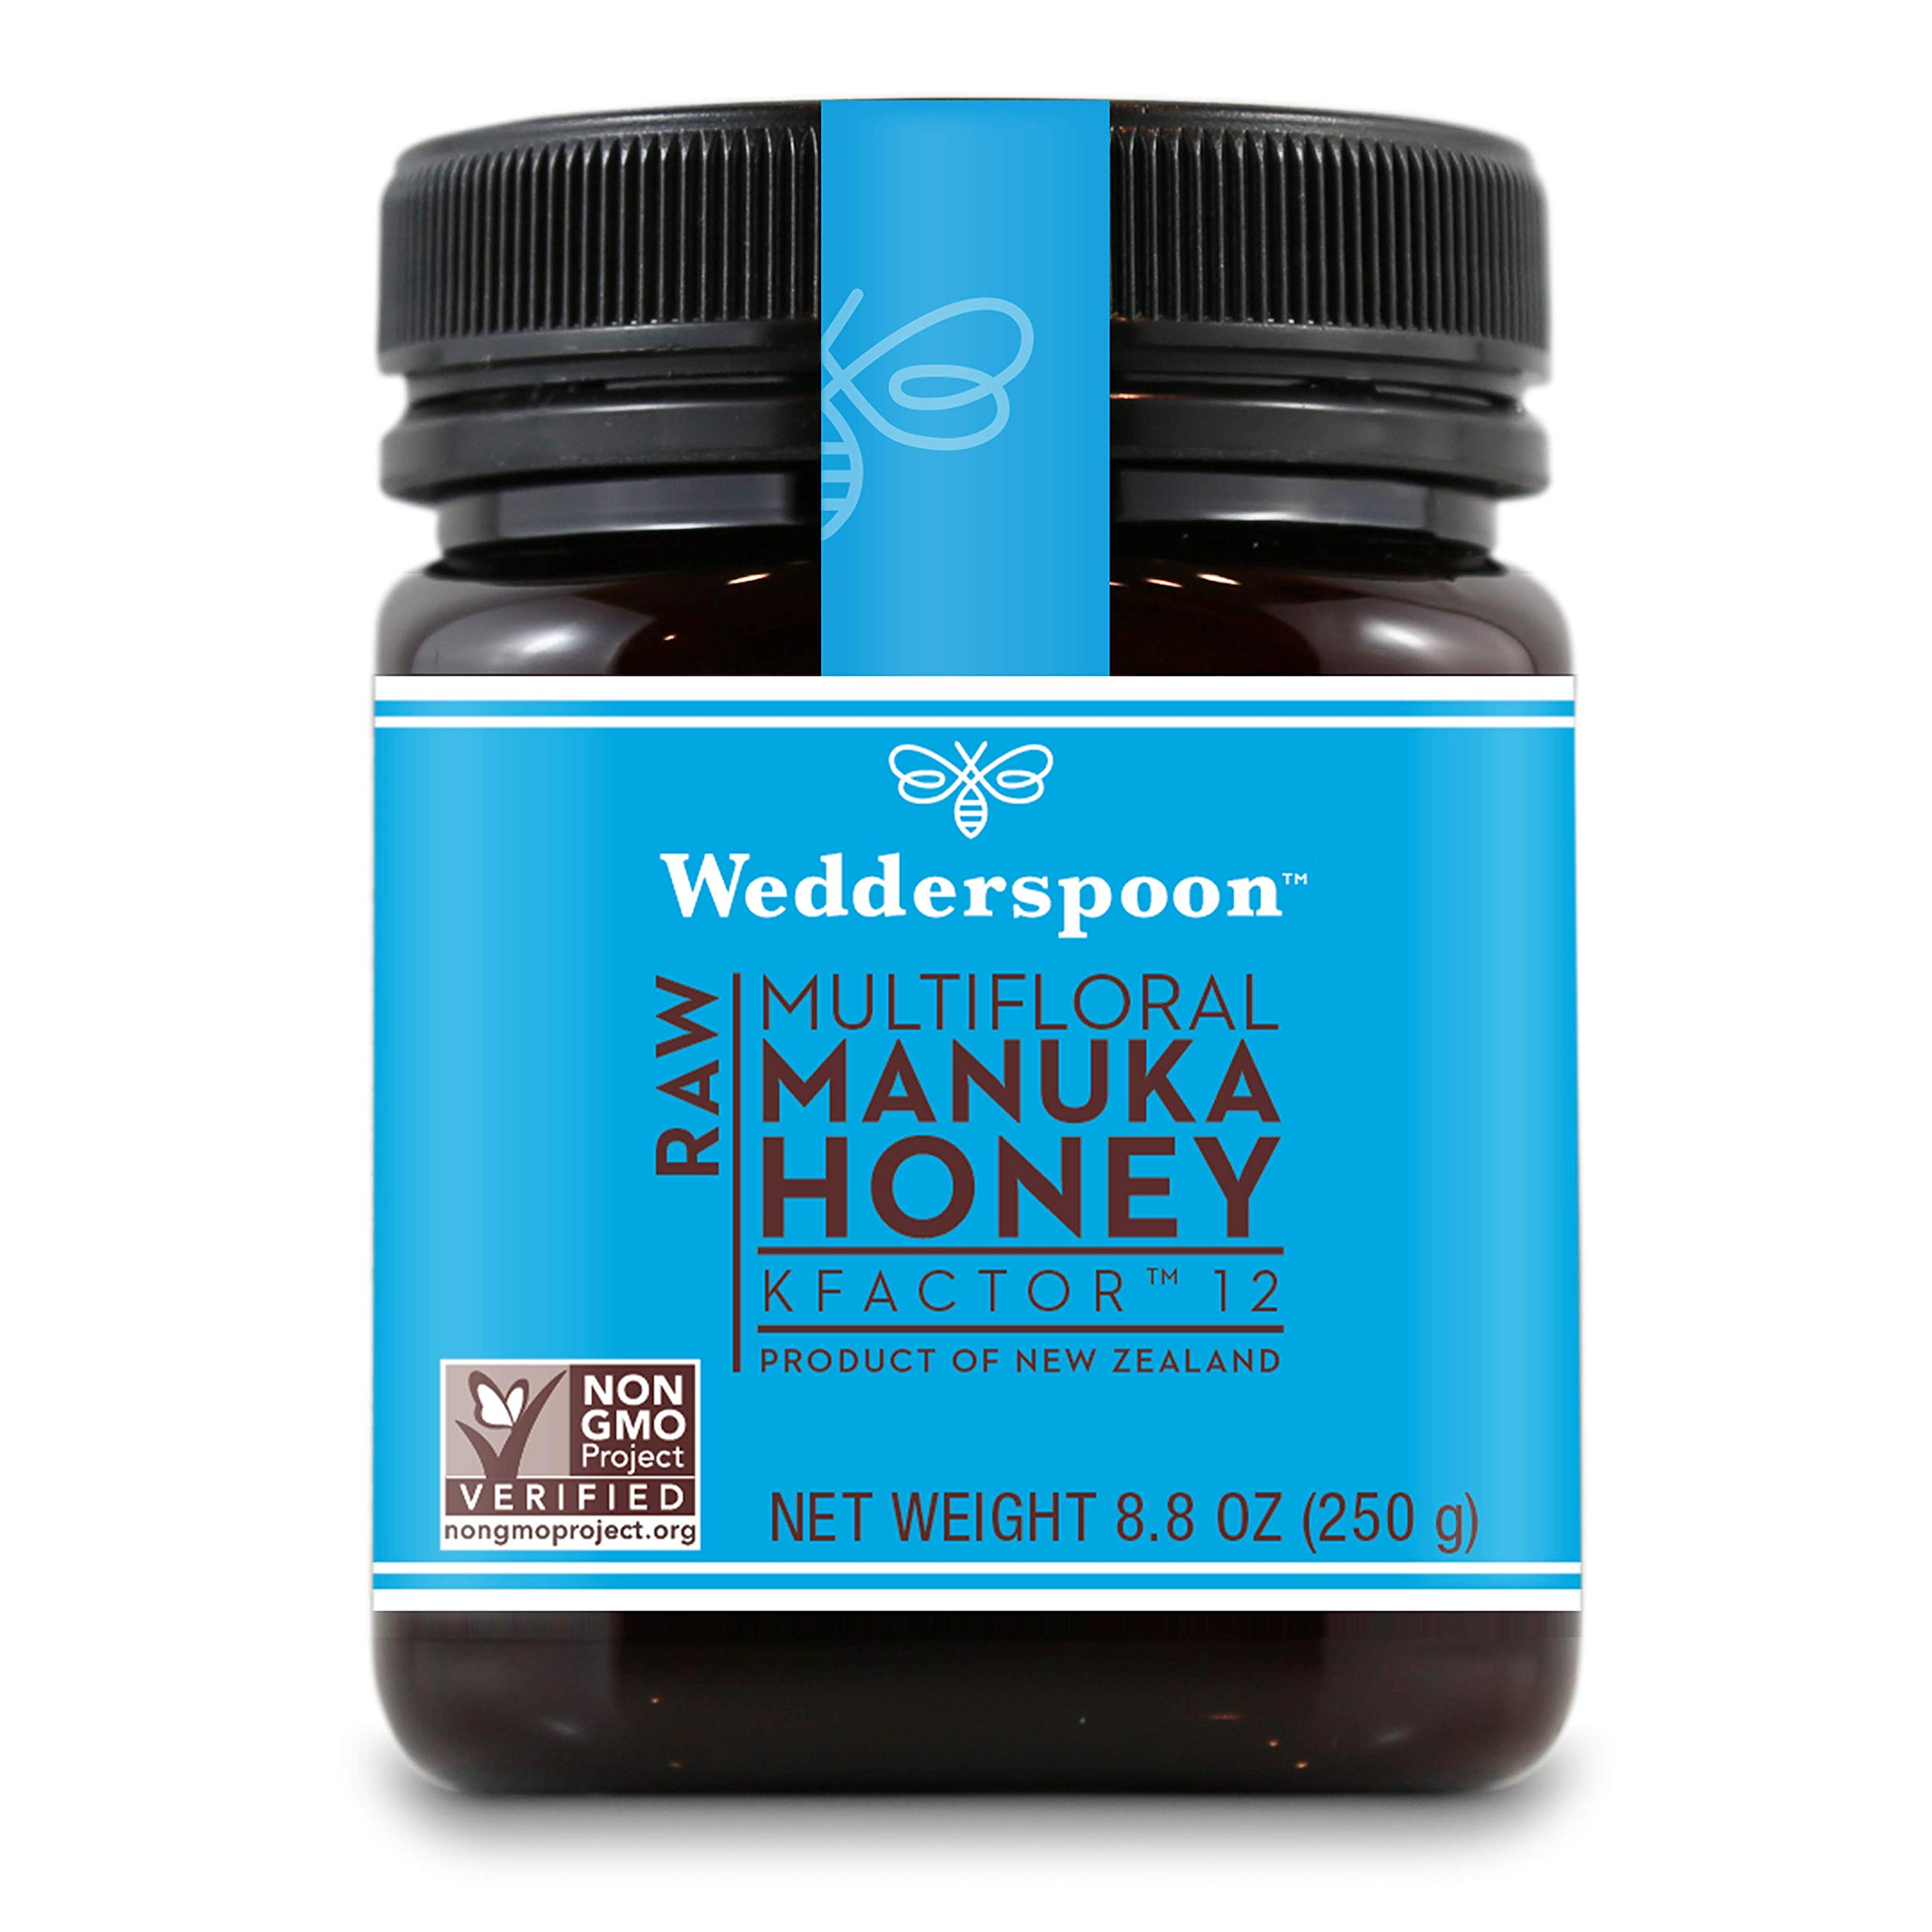 Wedderspoon Raw Premium Manuka Honey KFactor 12, 8.8 Oz, Unpasteurized, Genuine New Zealand Honey, Multi-Functional, Non-GMO Superfood